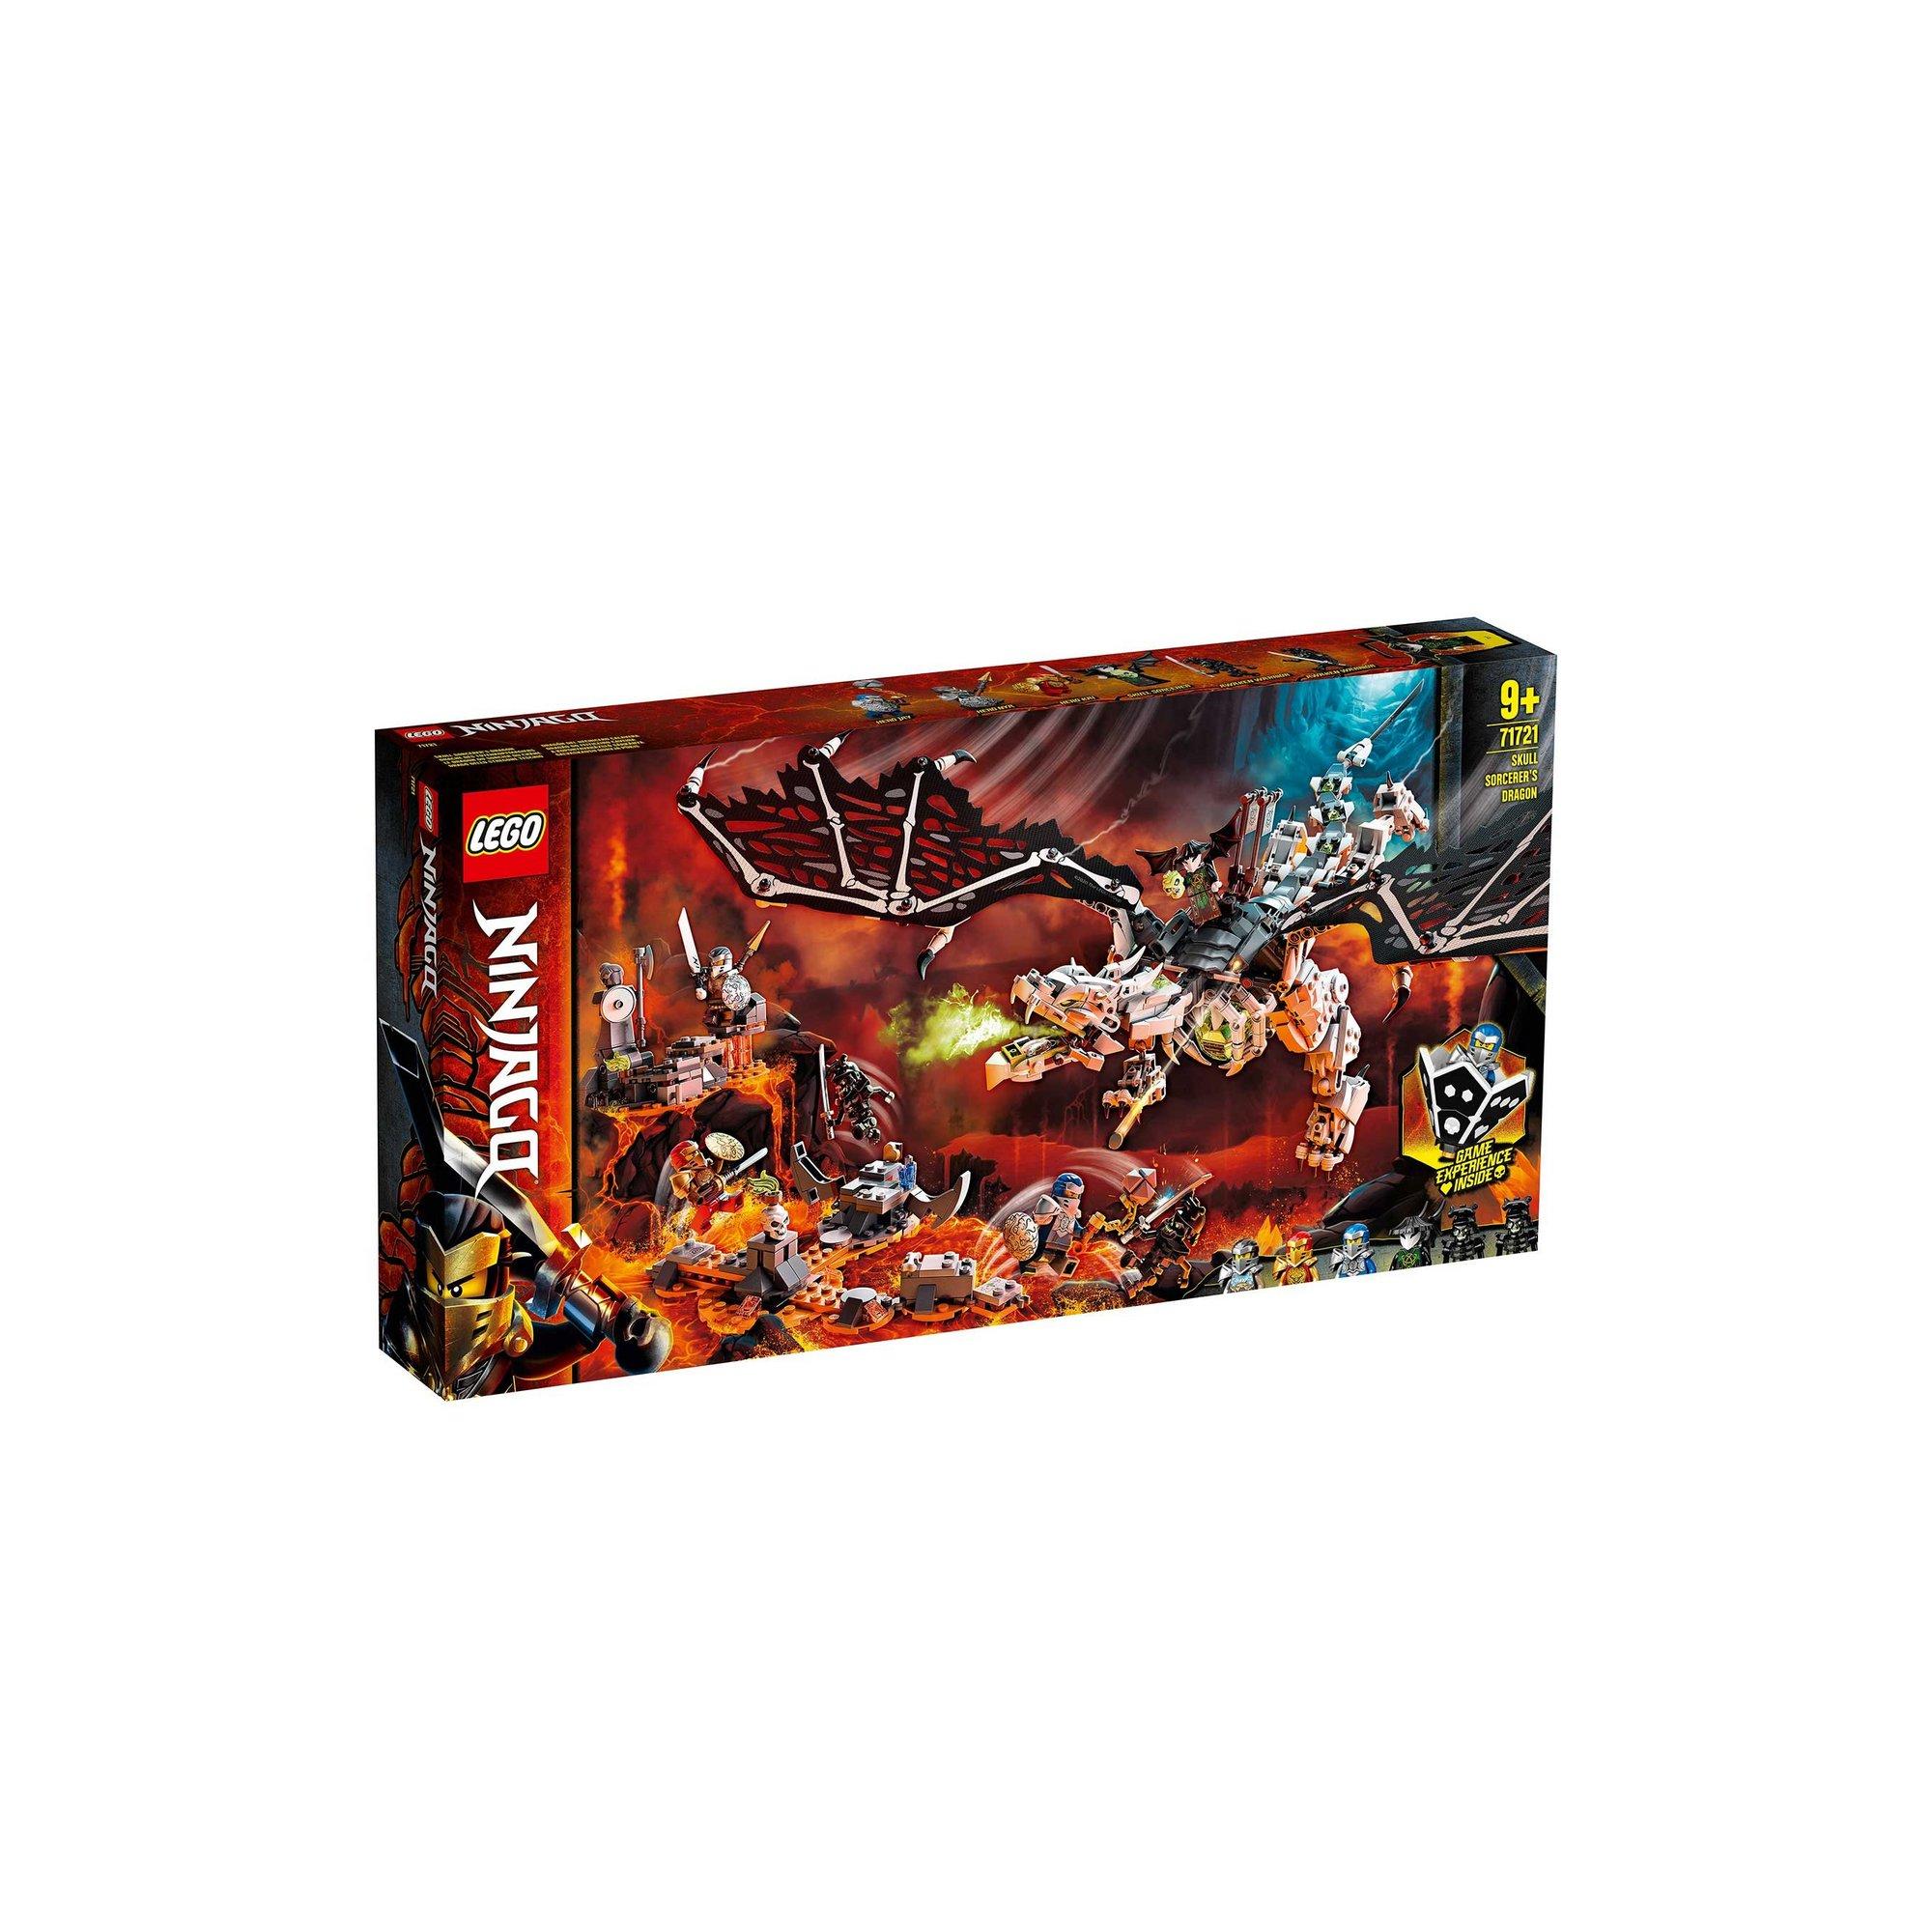 Image of LEGO Ninjago Skull Sorcerers Dragon